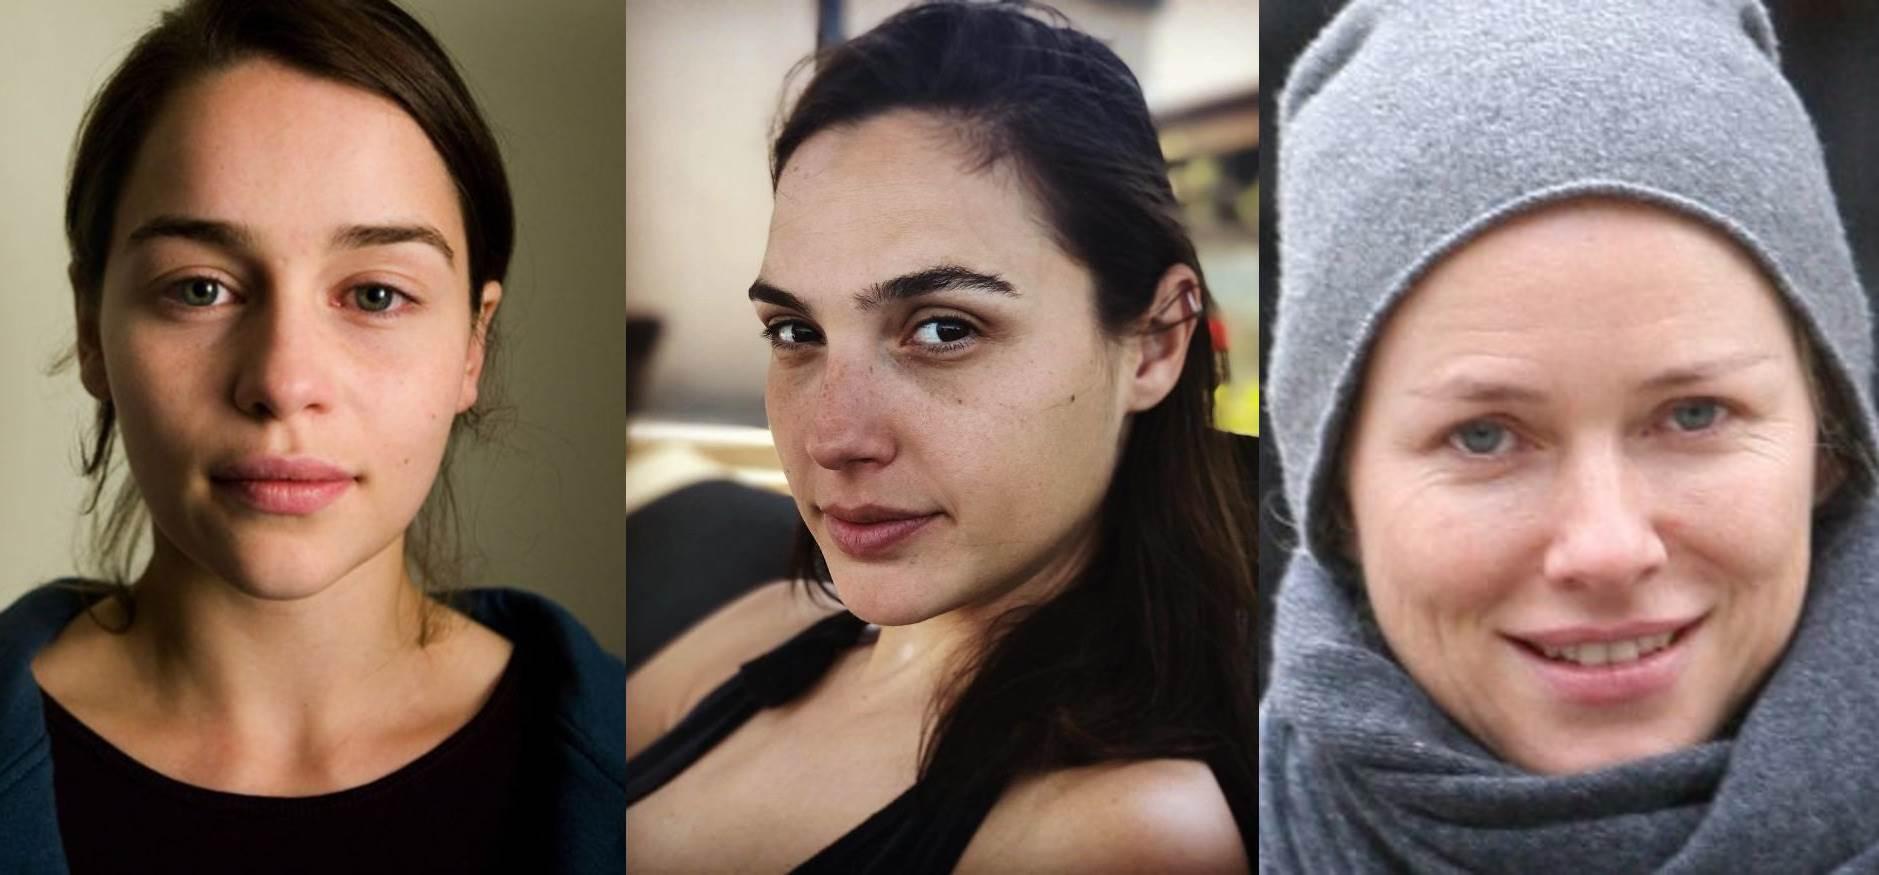 Как выглядят актрисы Голливуда без макияжа (18 фото)